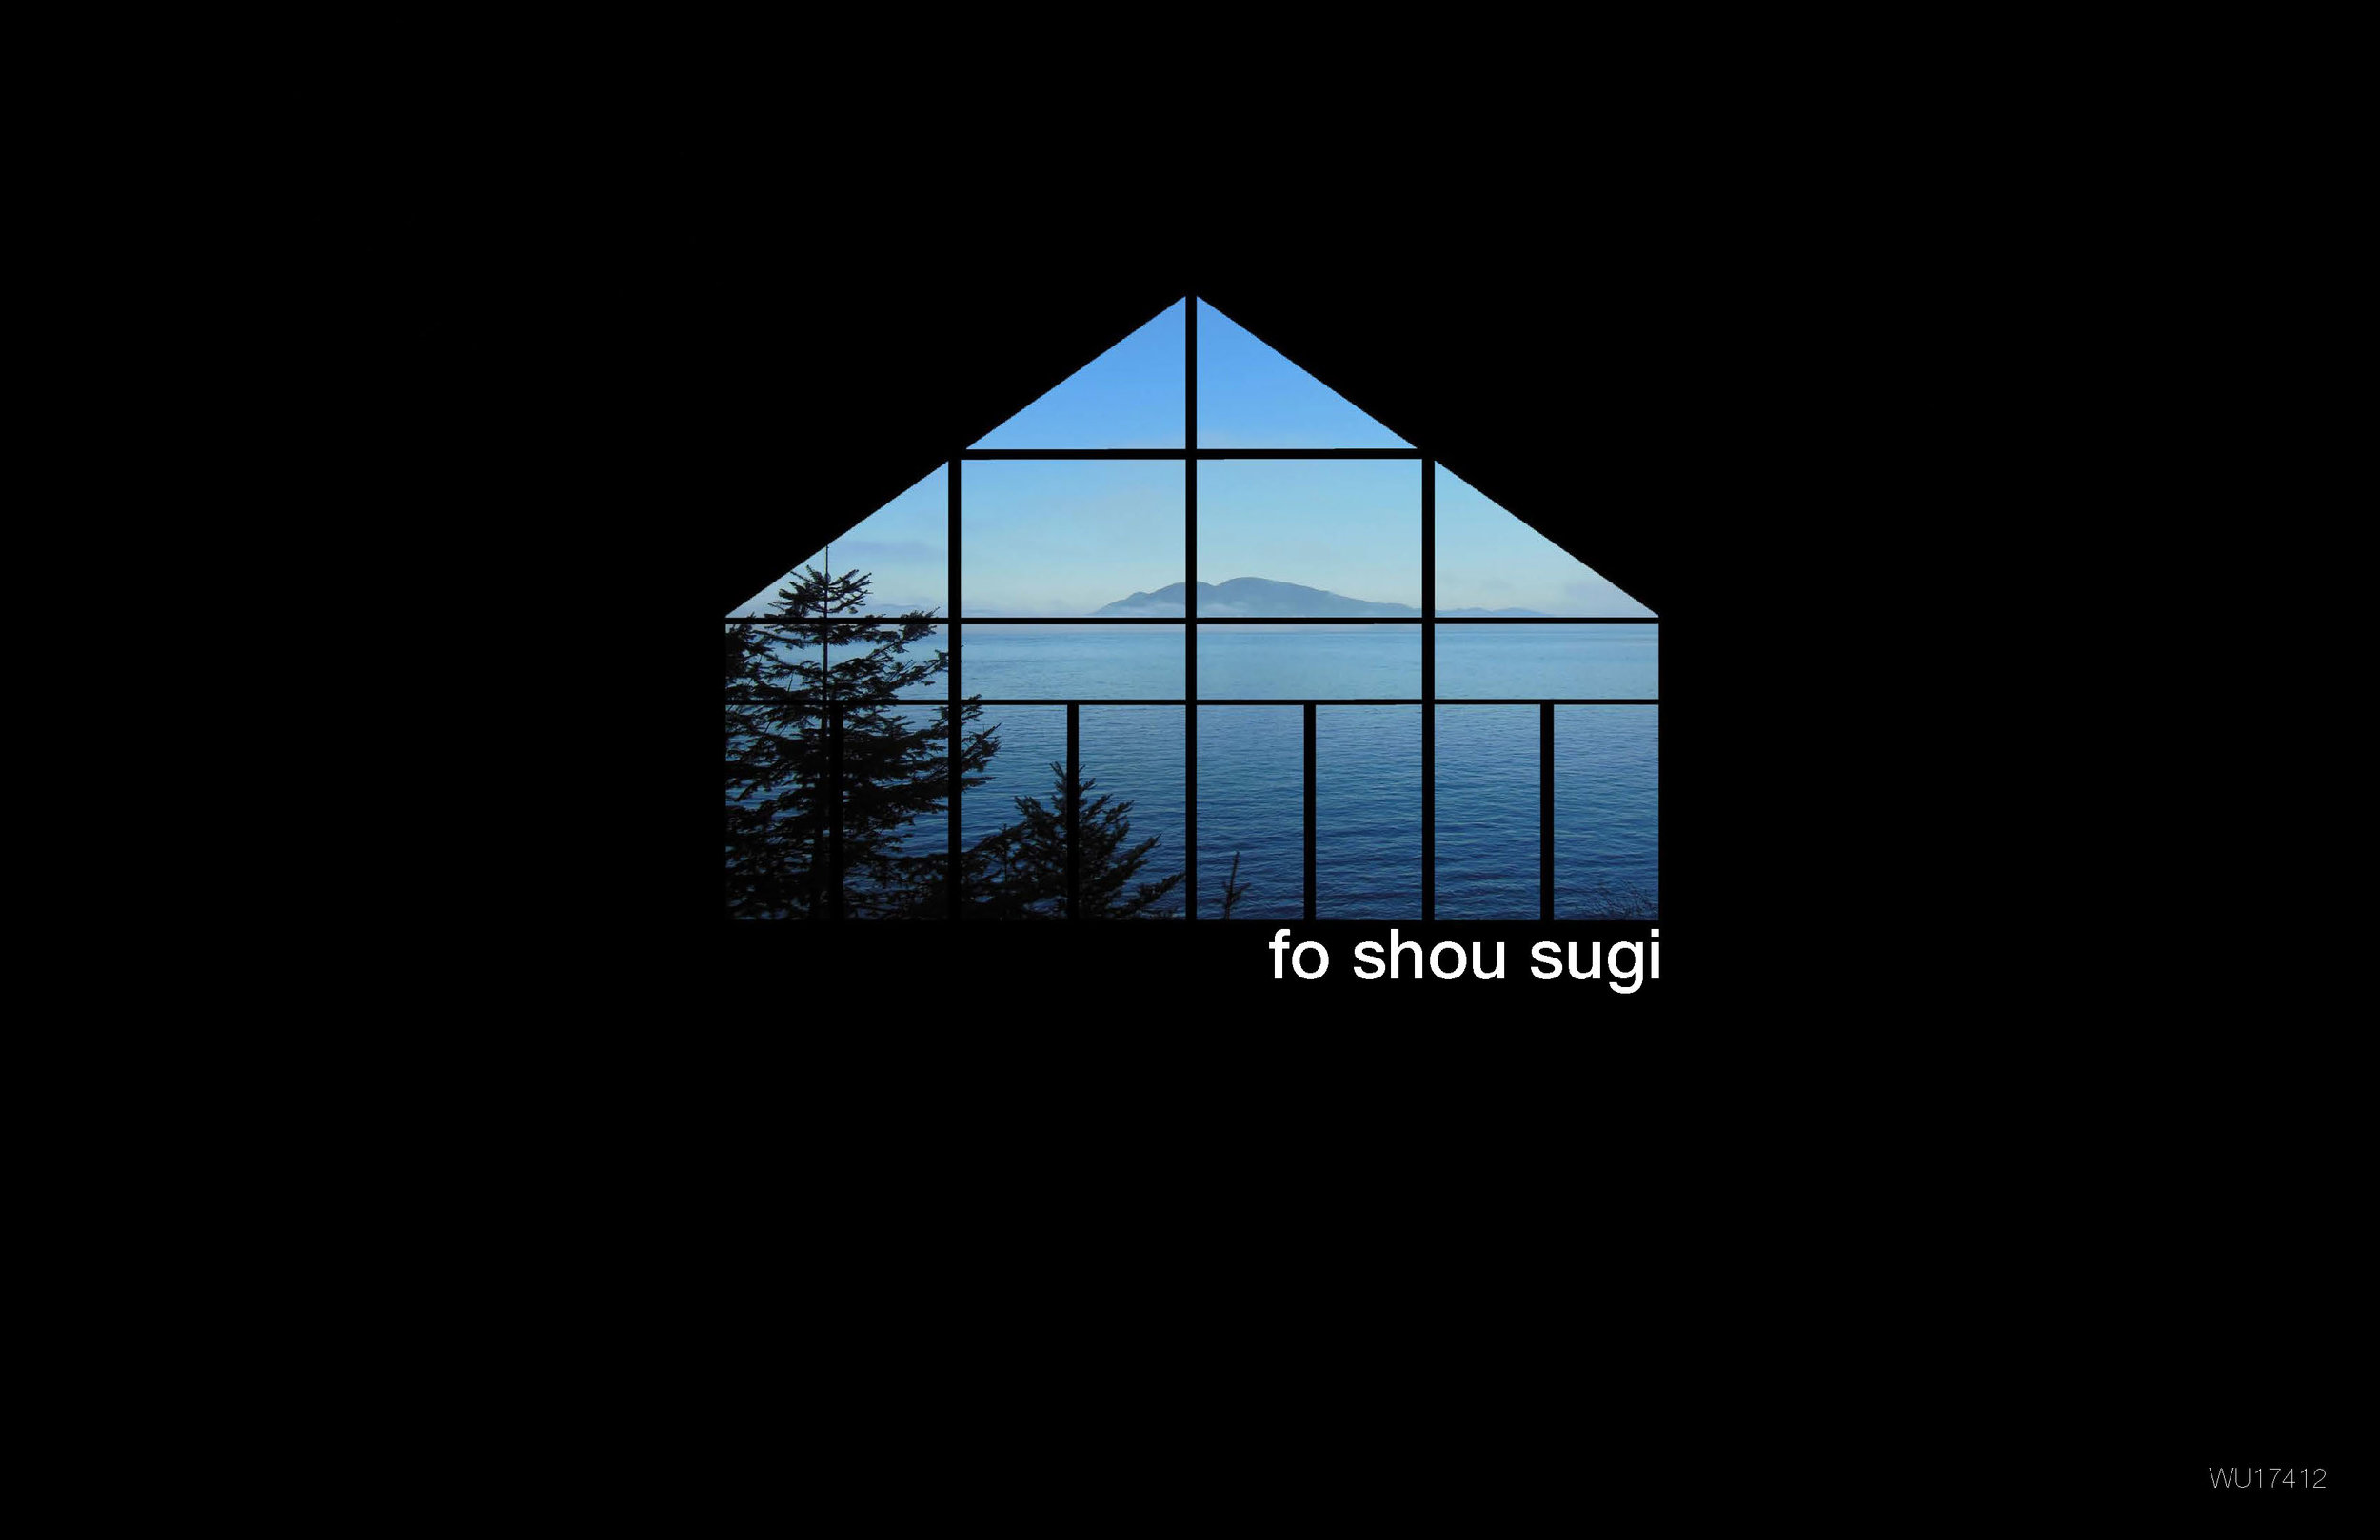 WU17412 - Fo Shou Sugi_Page_01.jpg